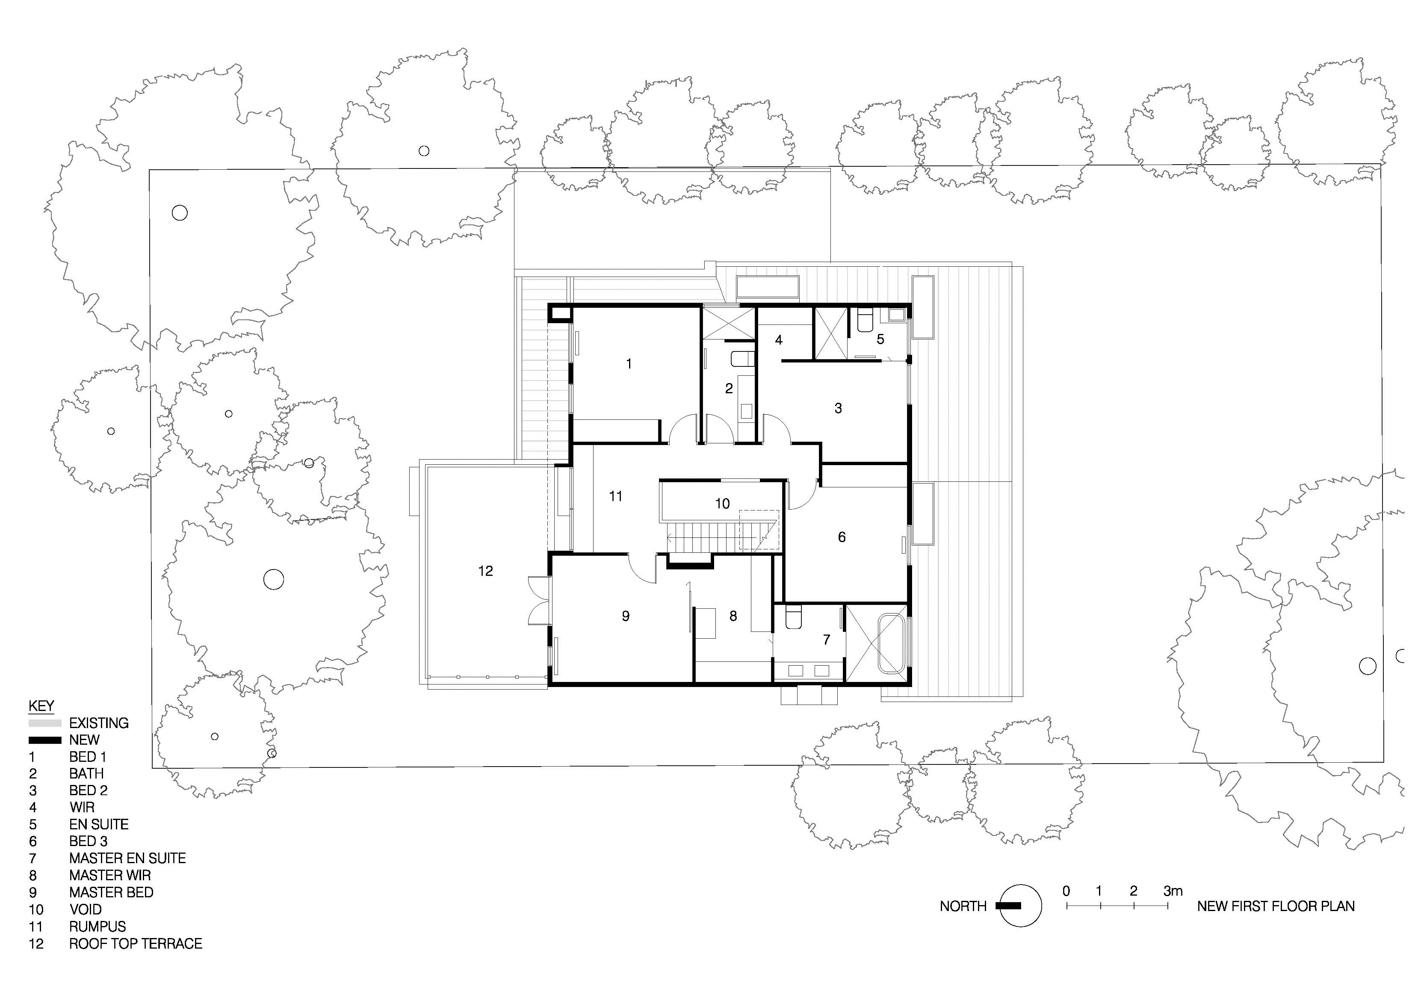 ruffey-lake-house-inbetween-architecture-the-design-emotive-38.jpg